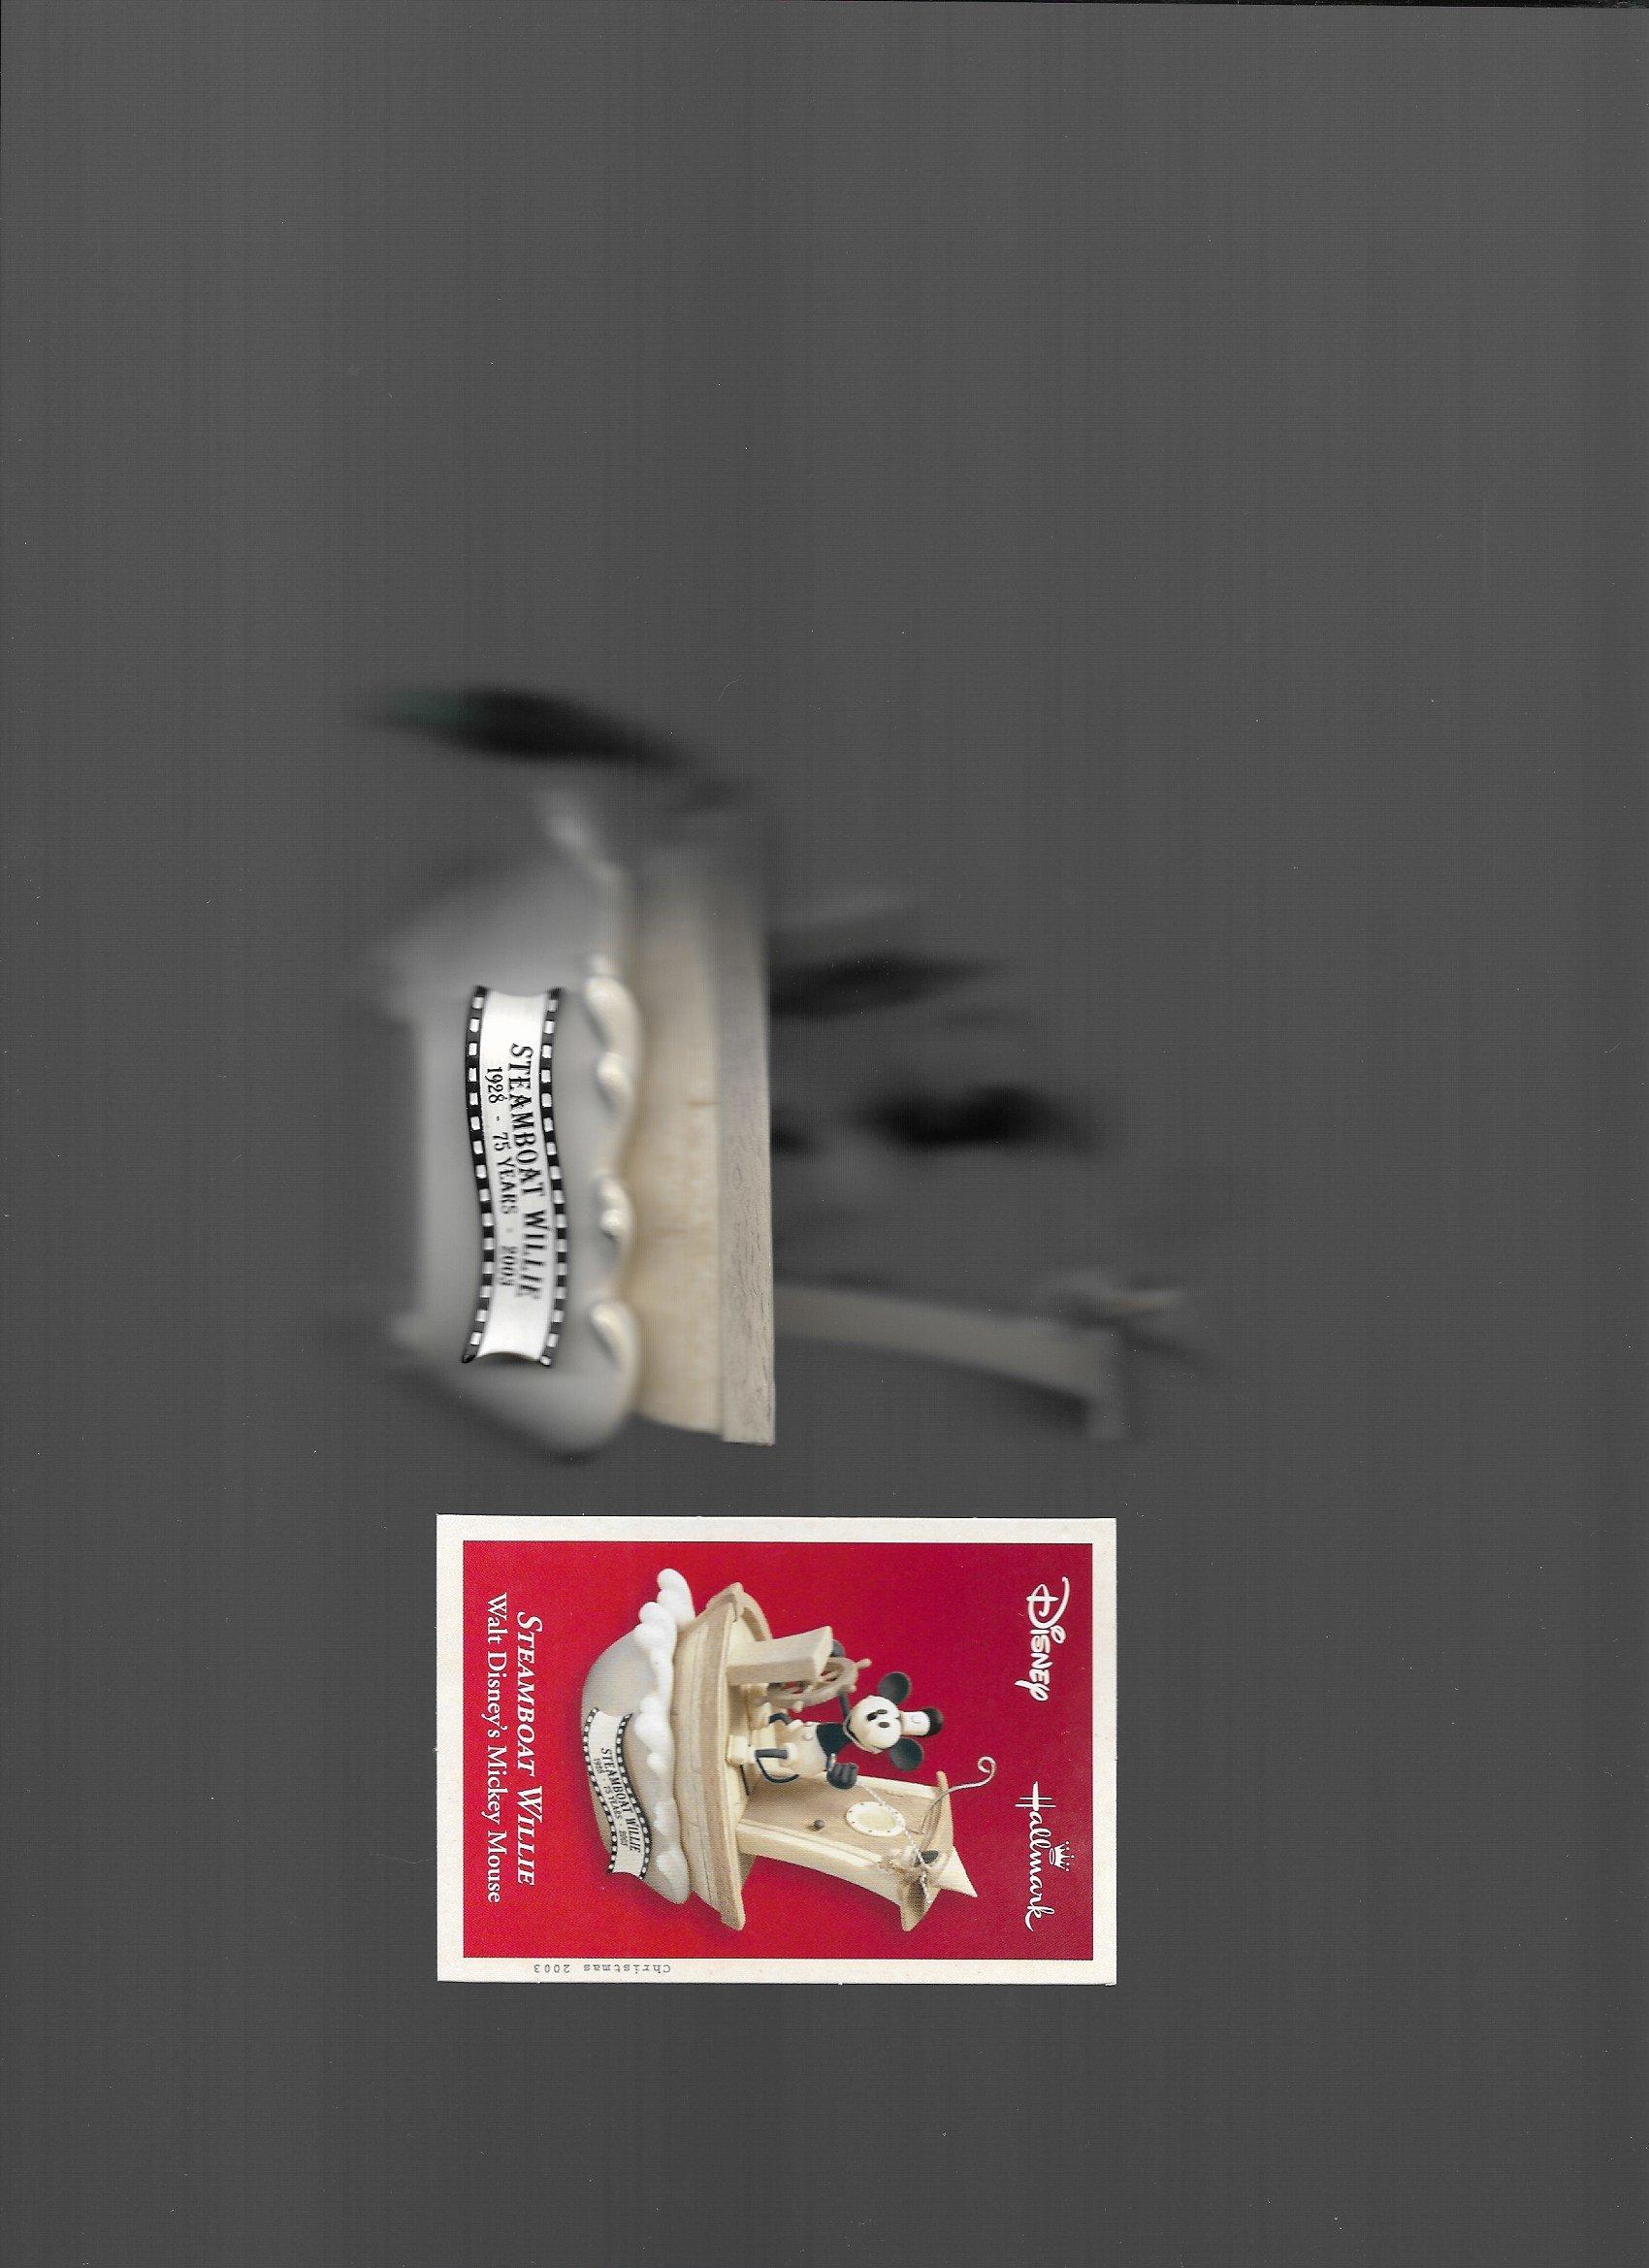 qxd5047蒸汽船 Willie walt 米奇老鼠2003Hallmark 纪念品声音和运动装饰品